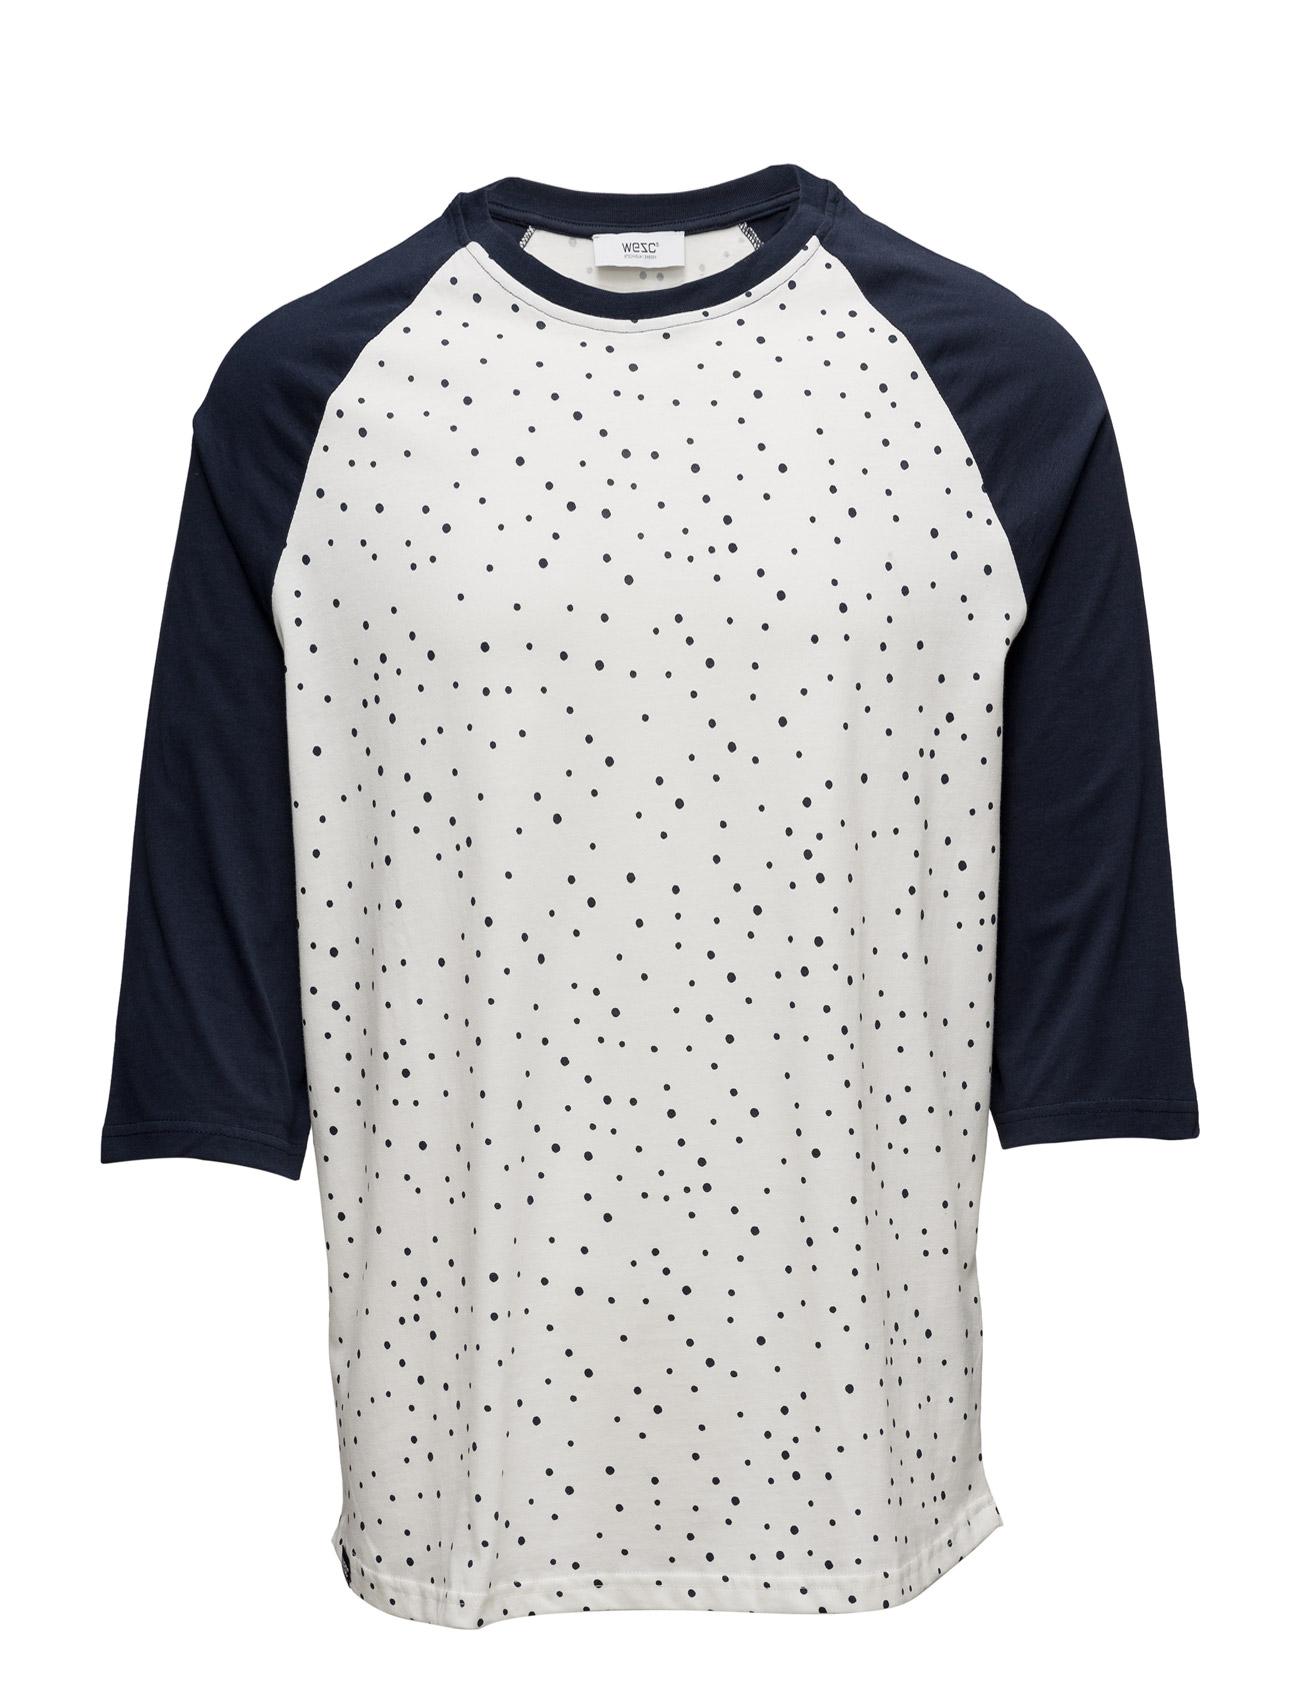 wesc Balint s/s t-shirt, 3/4 sle på boozt.com dk